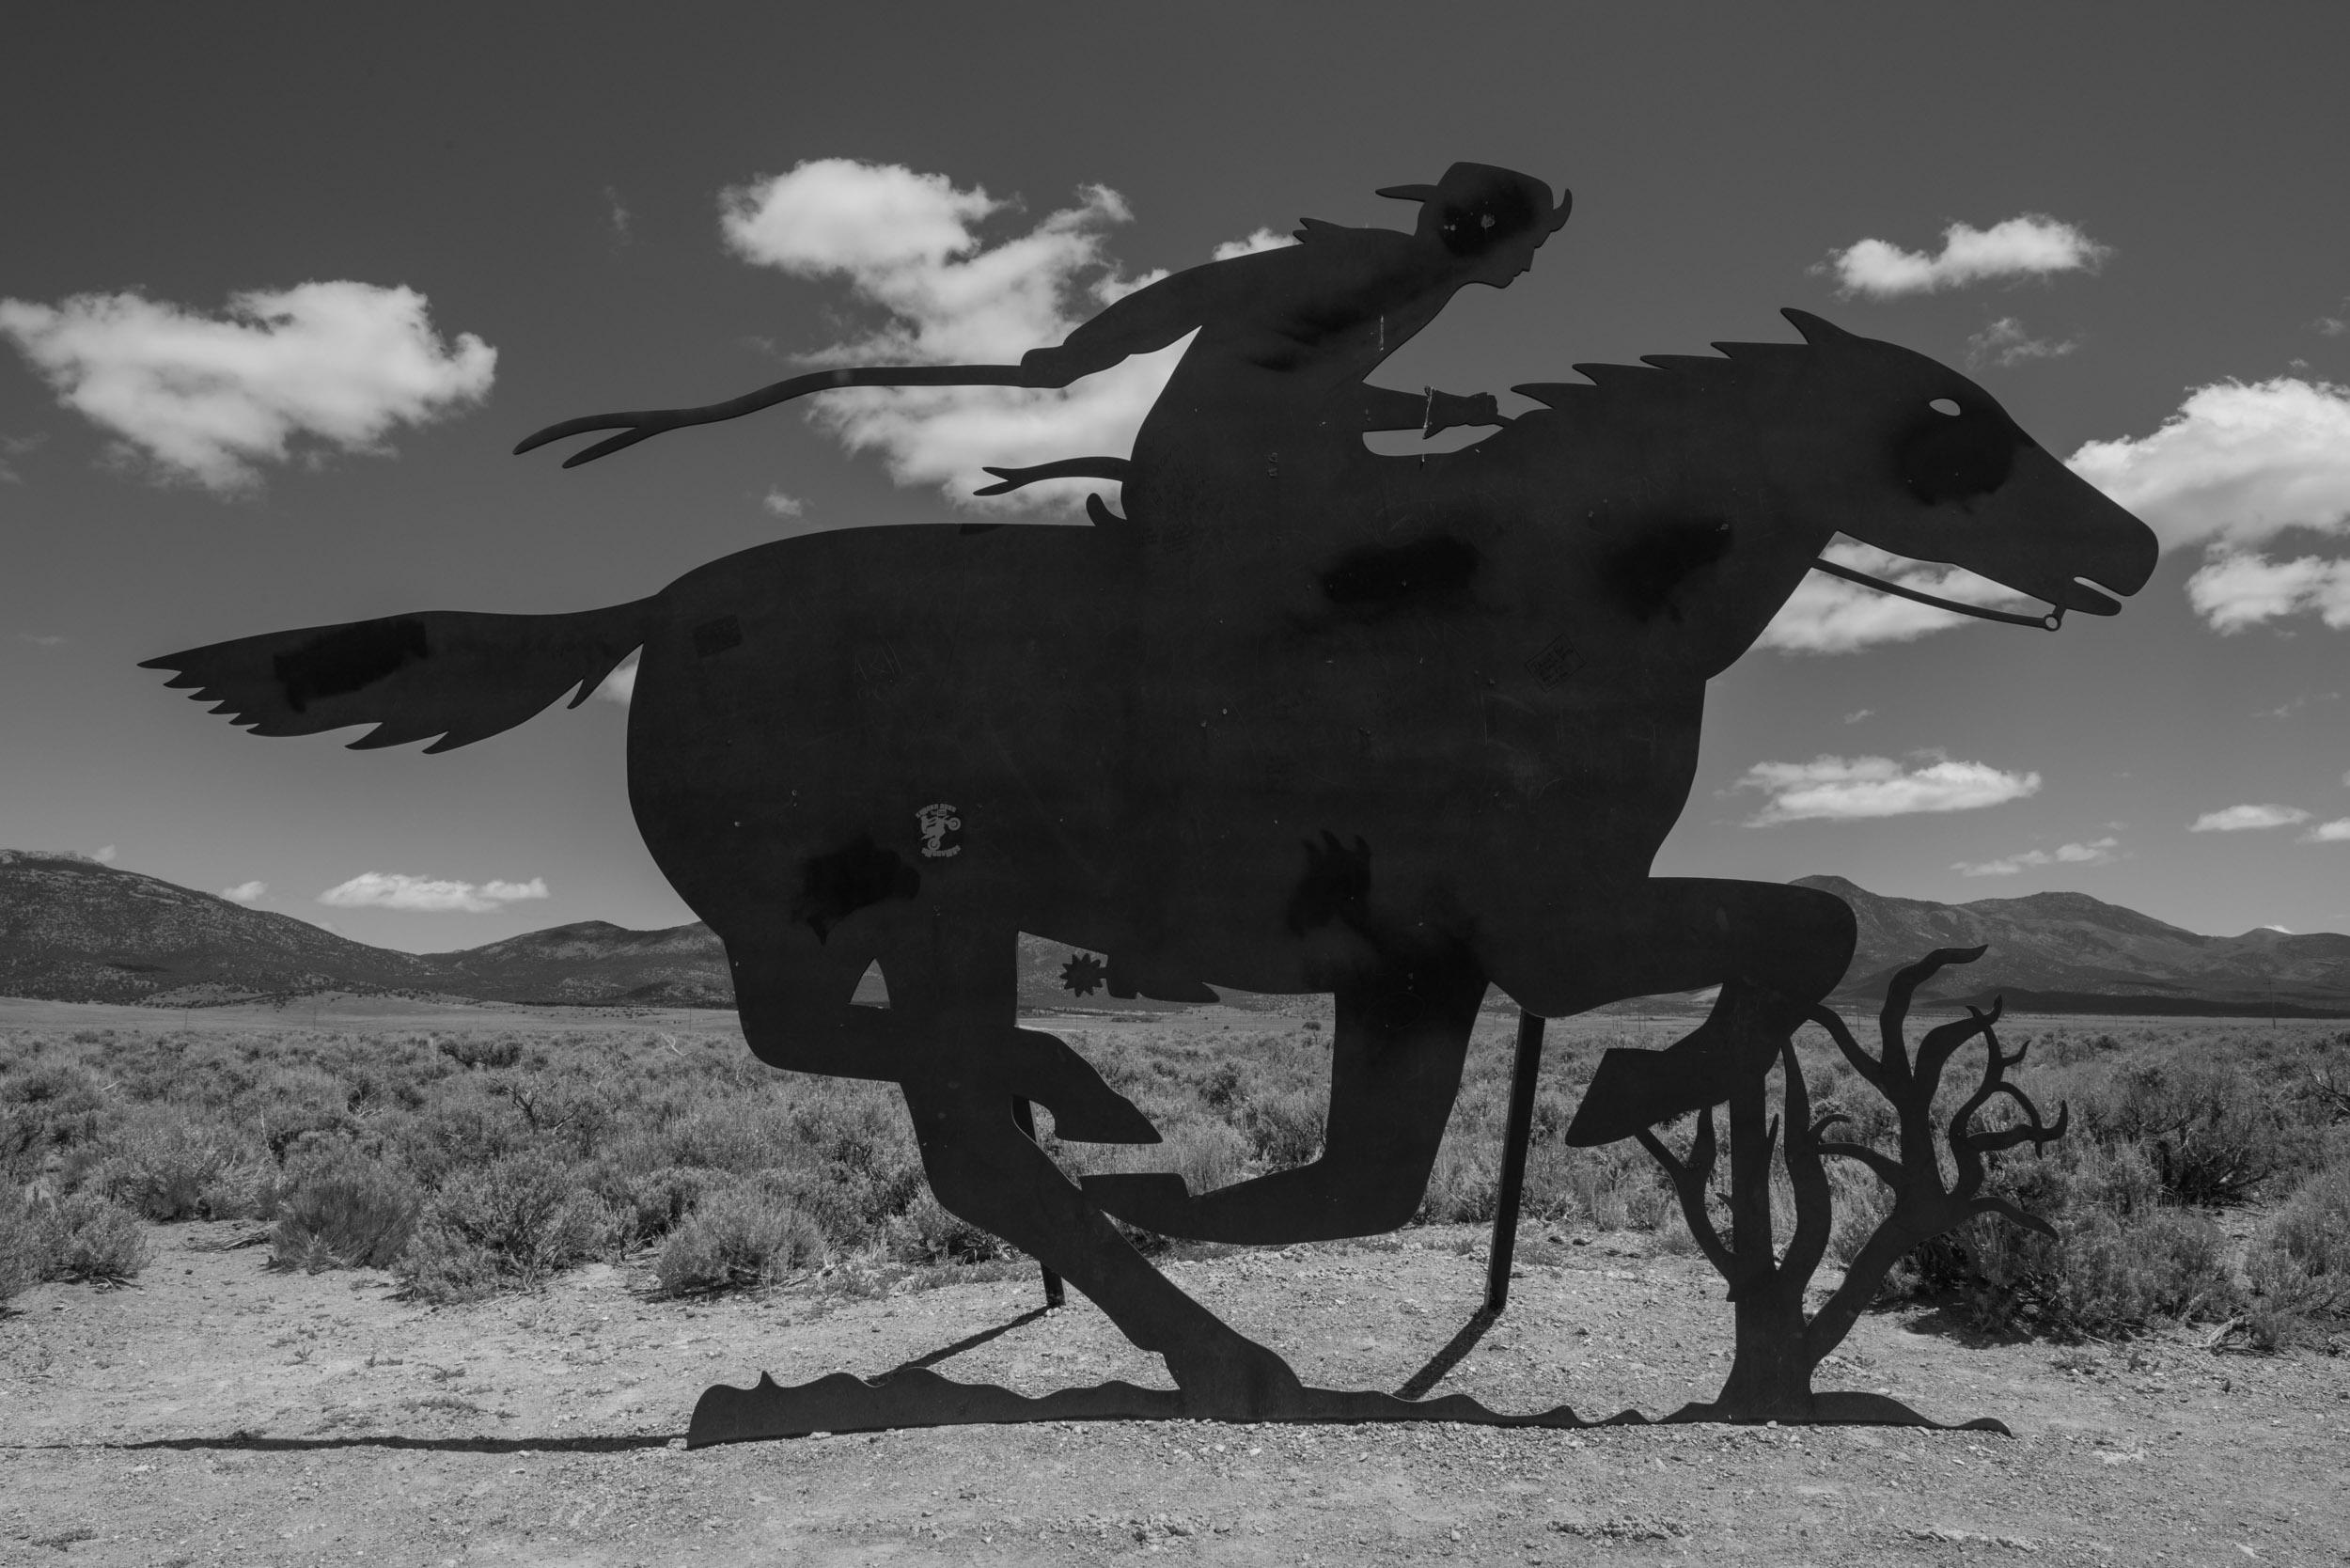 Pony Express Trail Marker near Ely, Nevada in the Great Basin.